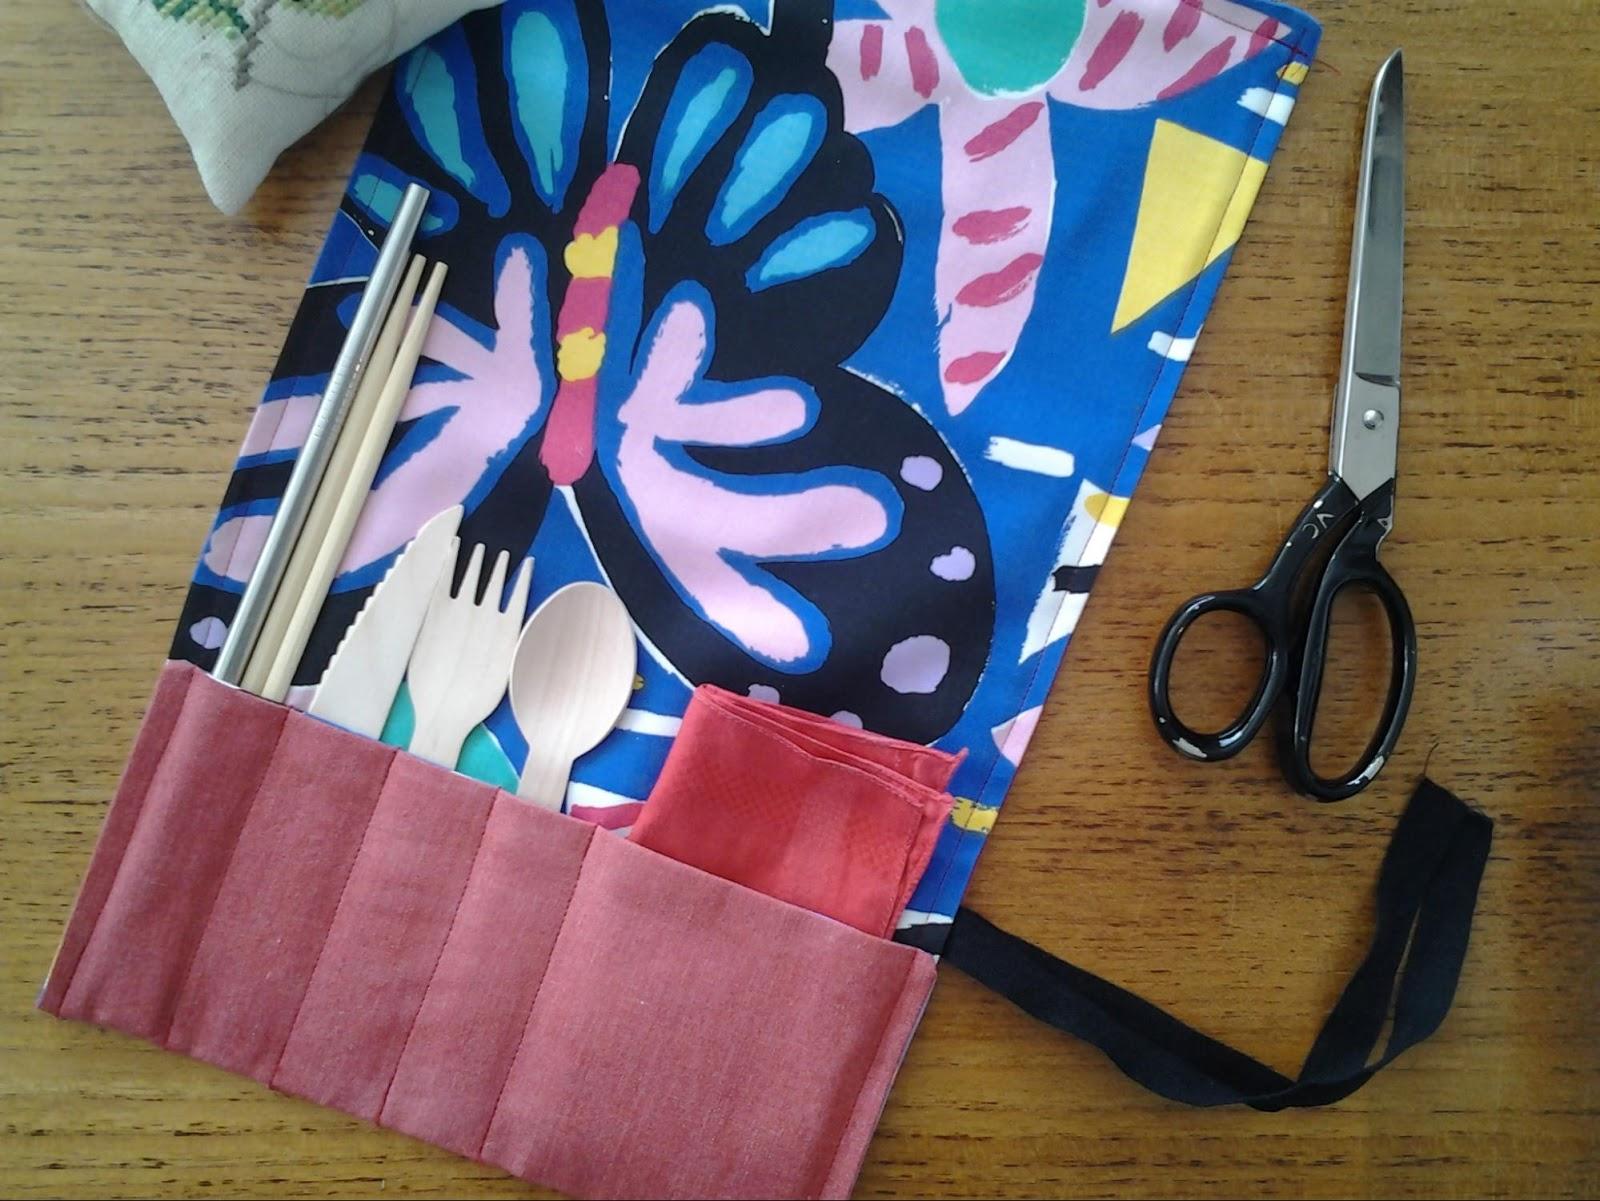 Cutlery wrap sewing tutorial